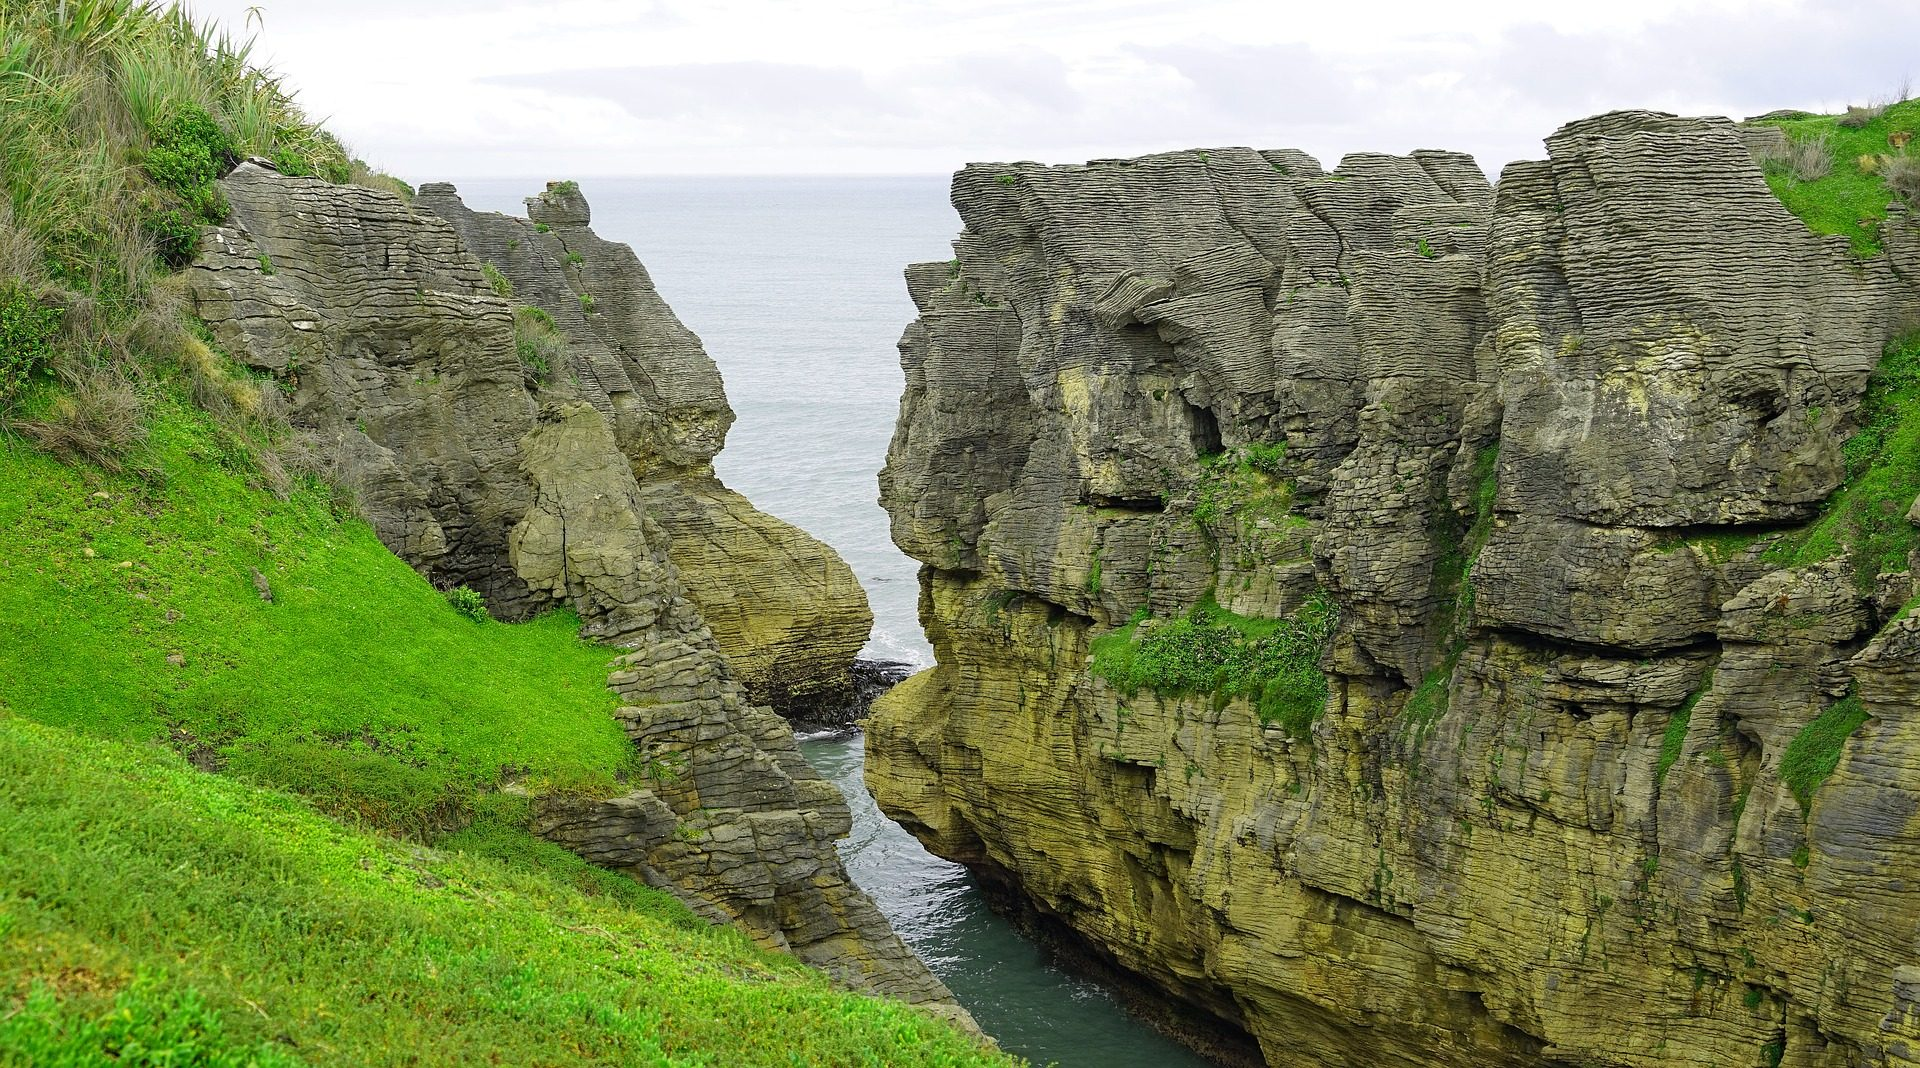 क्लिफ, कोस्टा, सागर, पैनकेक चट्टानों, न्यूज़ीलैंड - HD वॉलपेपर - प्रोफेसर-falken.com